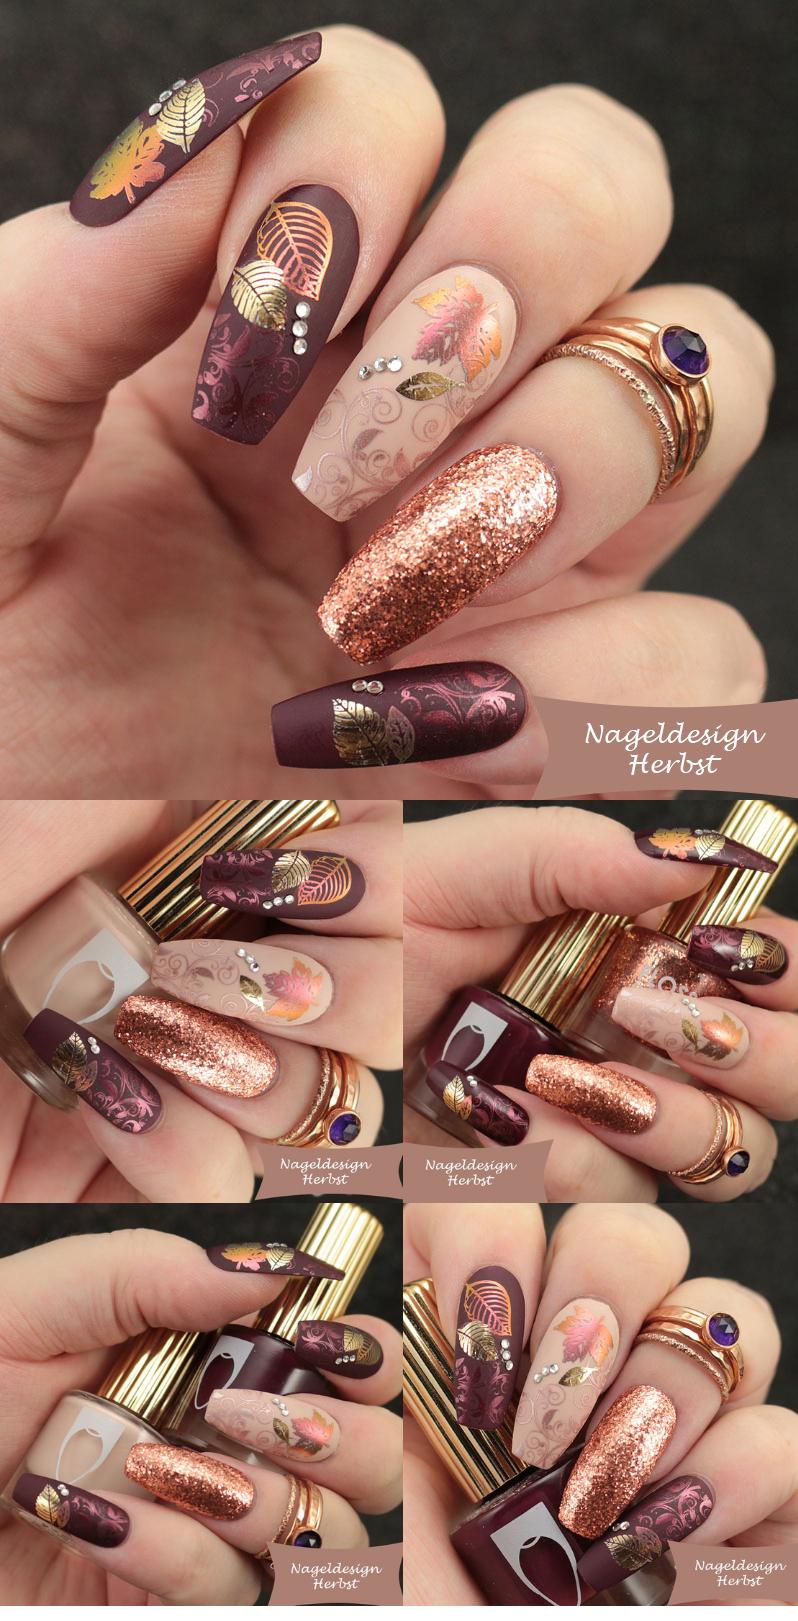 Nageldesign Herbst 2018: Trendige Farben